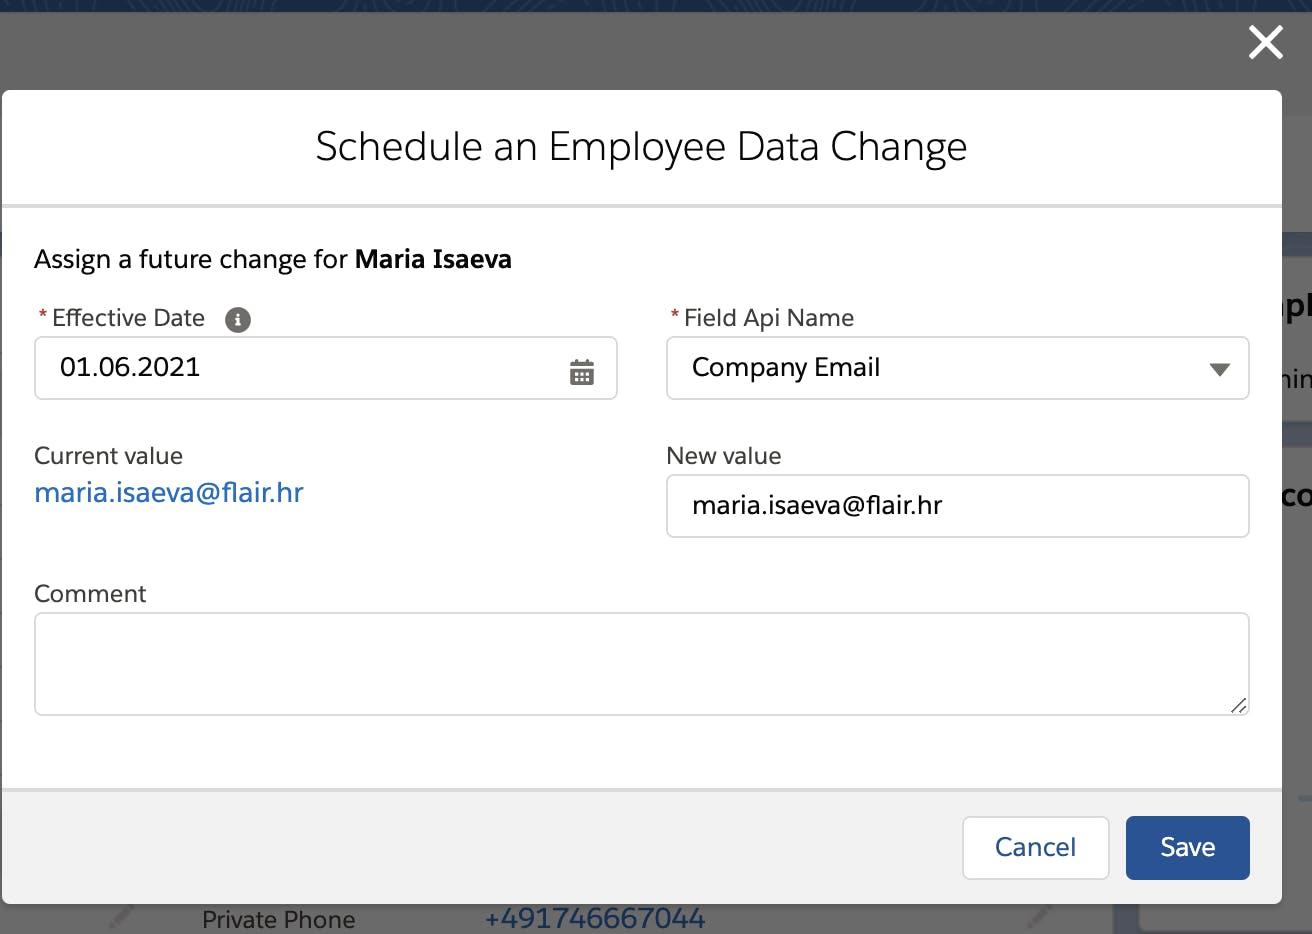 Schedule an Employee Data Change - flair.hr